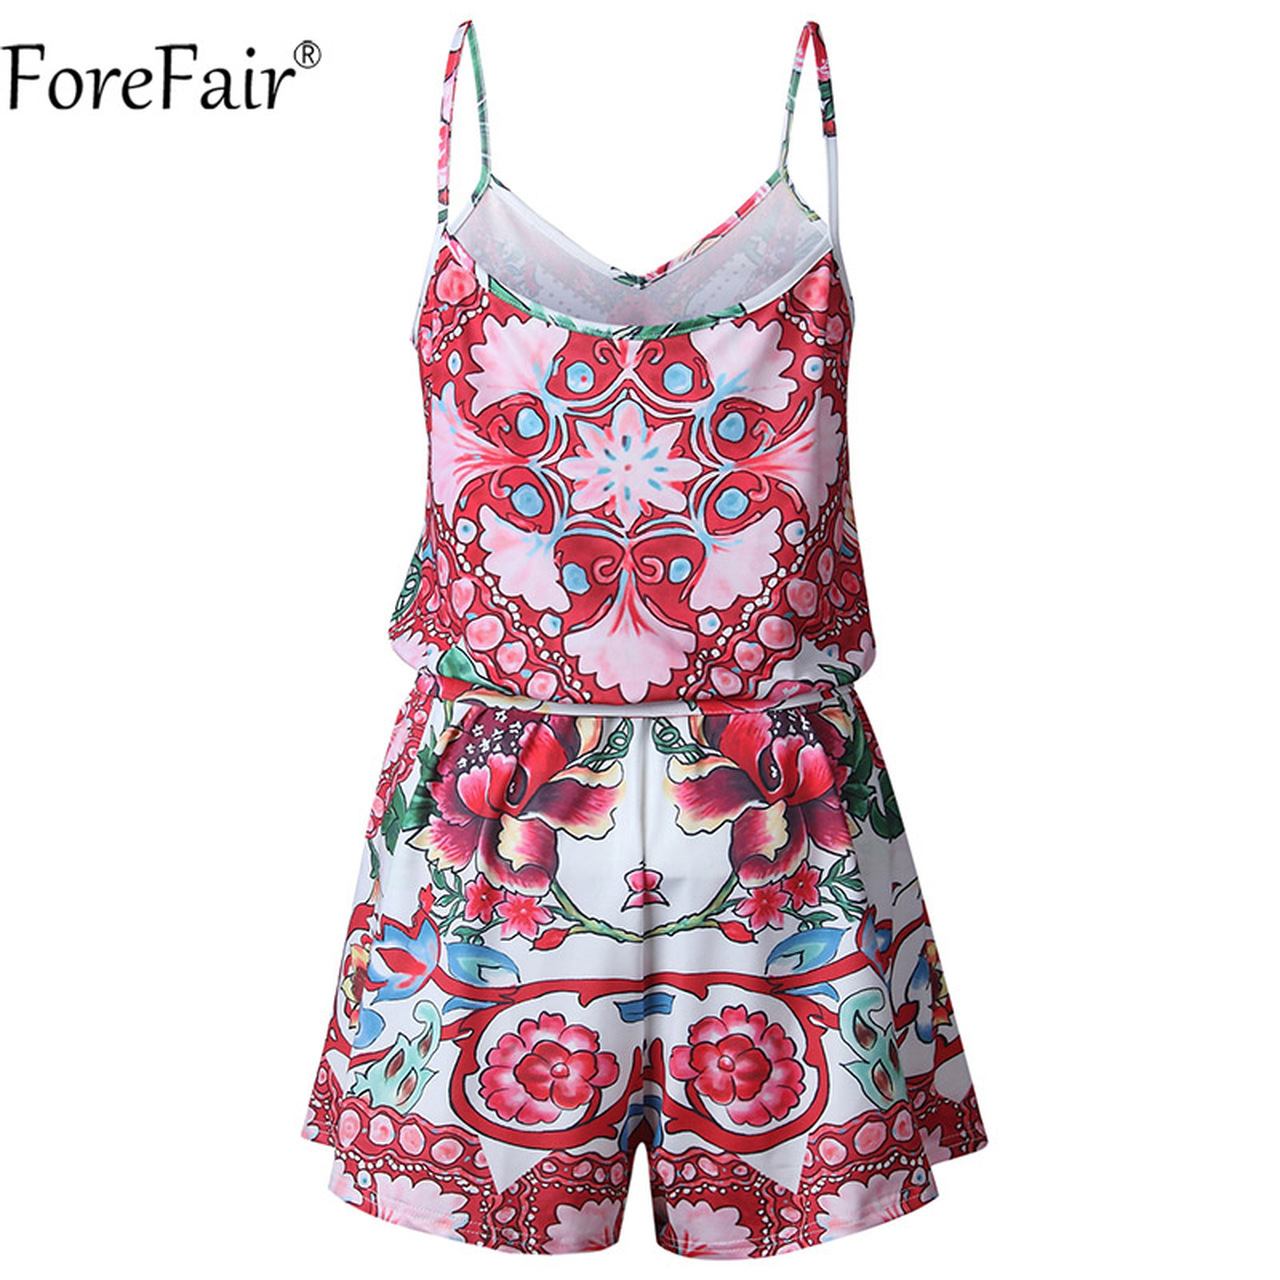 1f237bef23 ... ForeFair Backless Strap Floral Print V Neck Vintage Playsuits Casual  Summer Rompers women jumpsuit ...